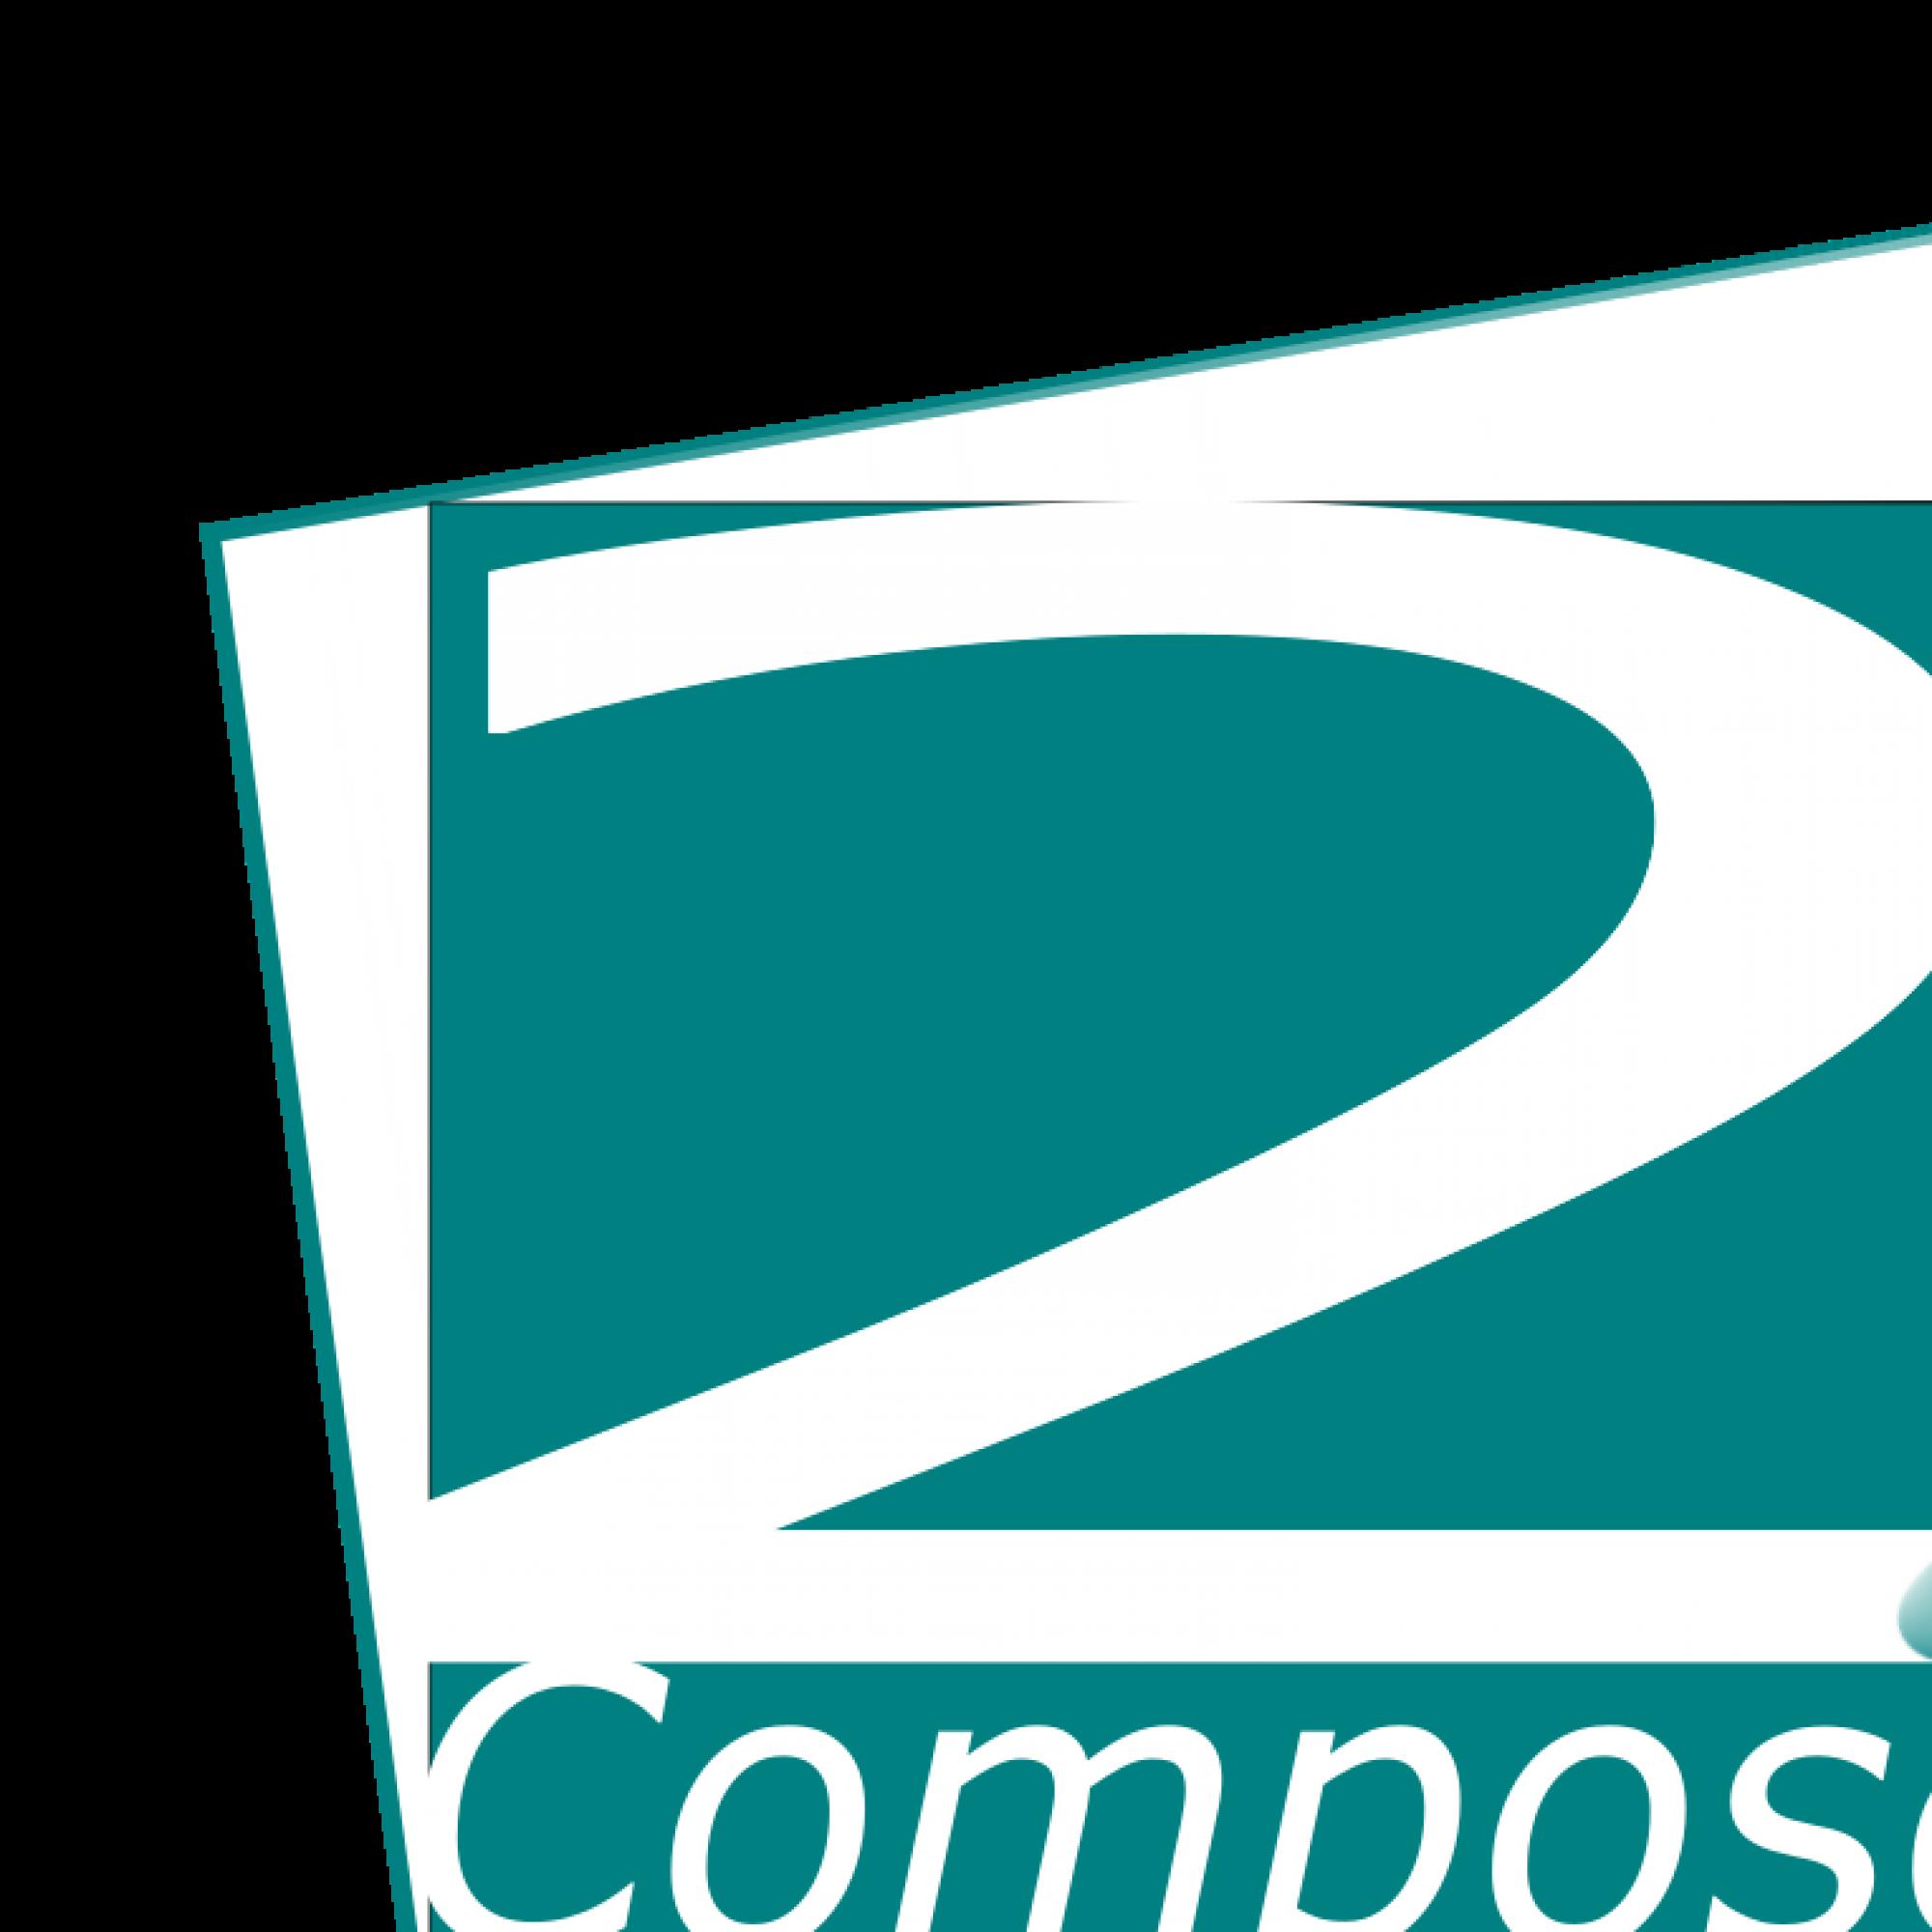 2Compose Creative Design